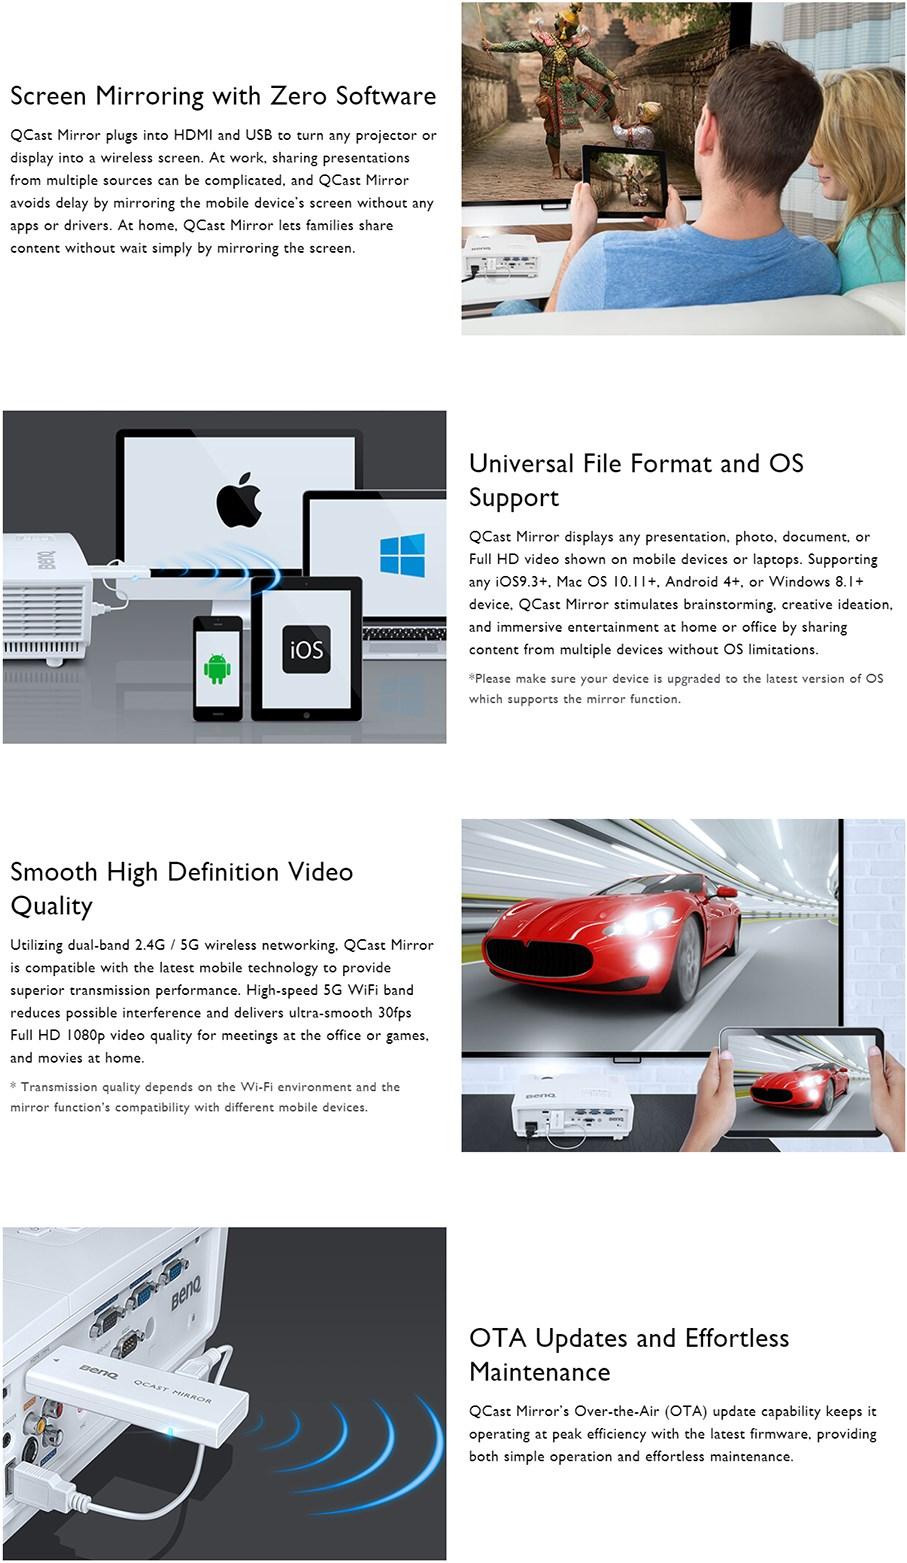 BenQ QP20 QCast Mirror HDMI Wireless Dongle - 5A JH328 10T | Mwave